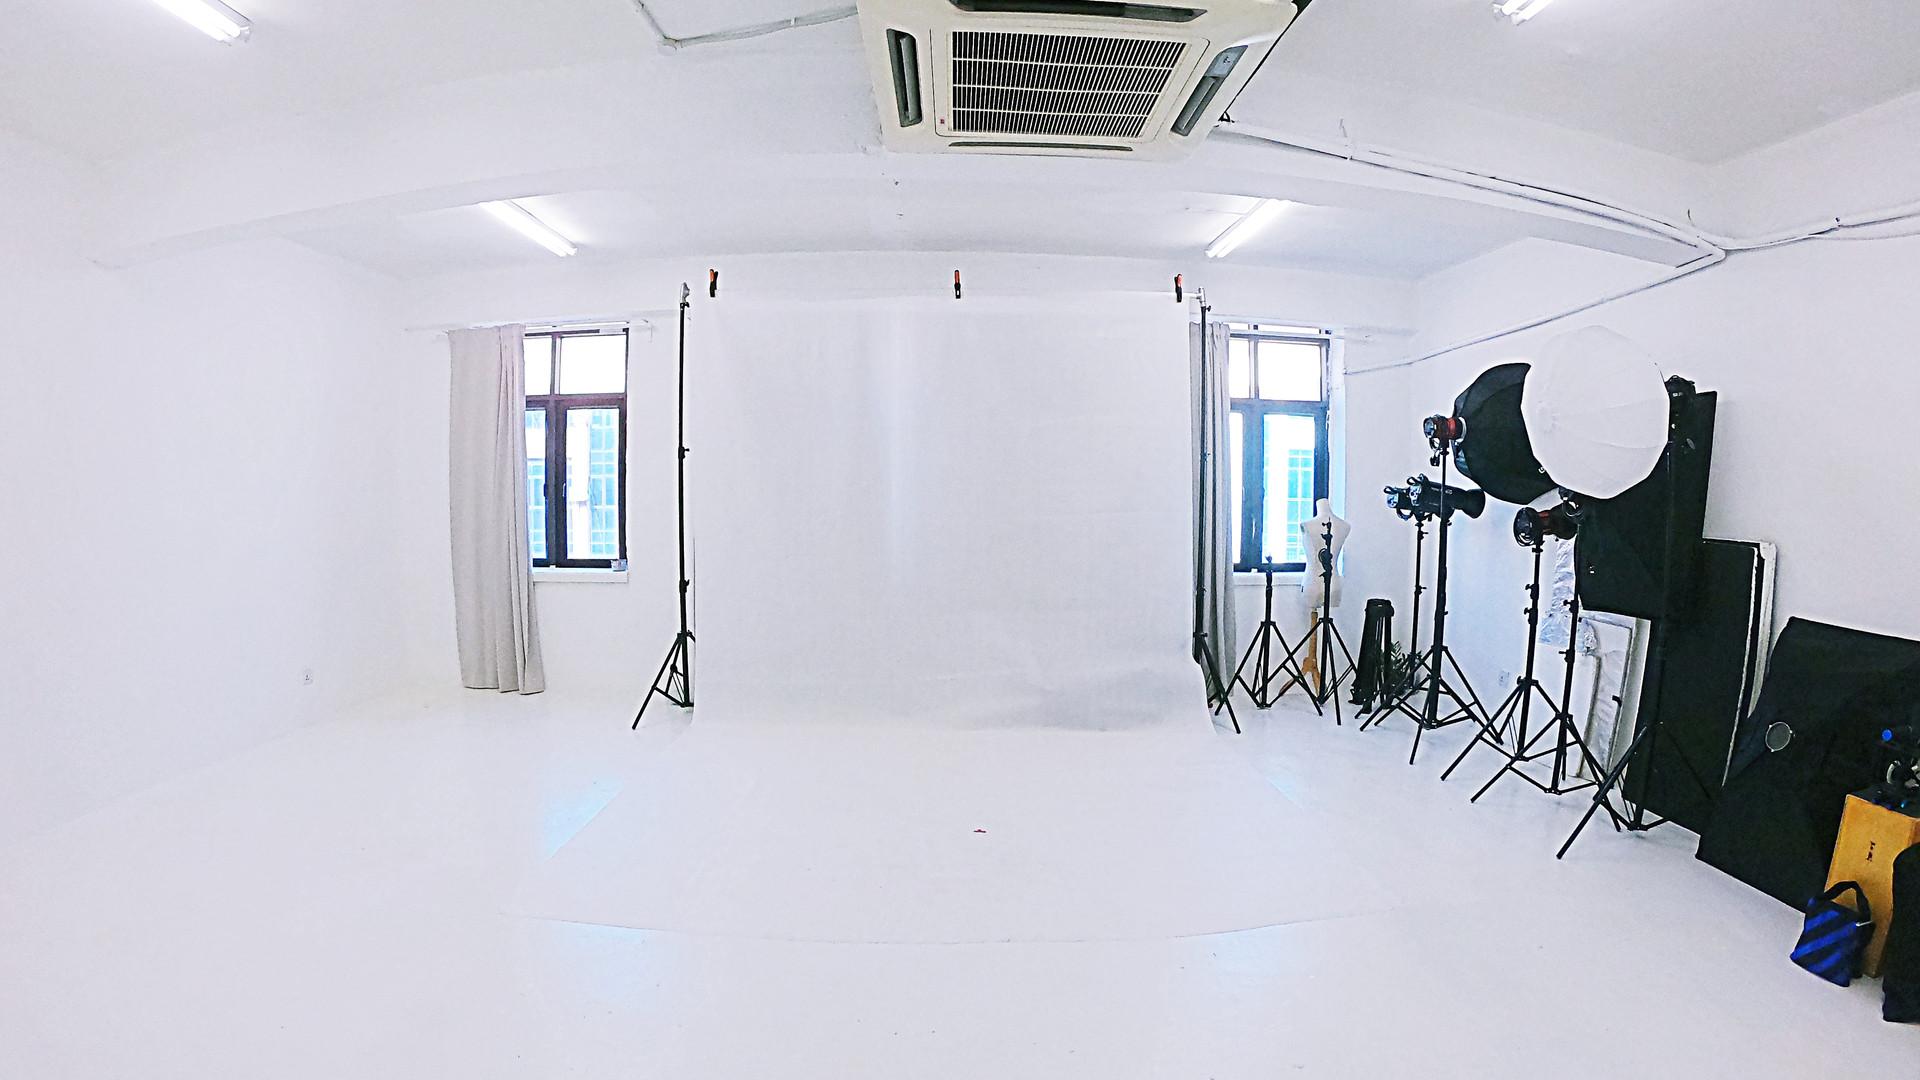 TheNextPictures_ShootingStudio_3R.jpg